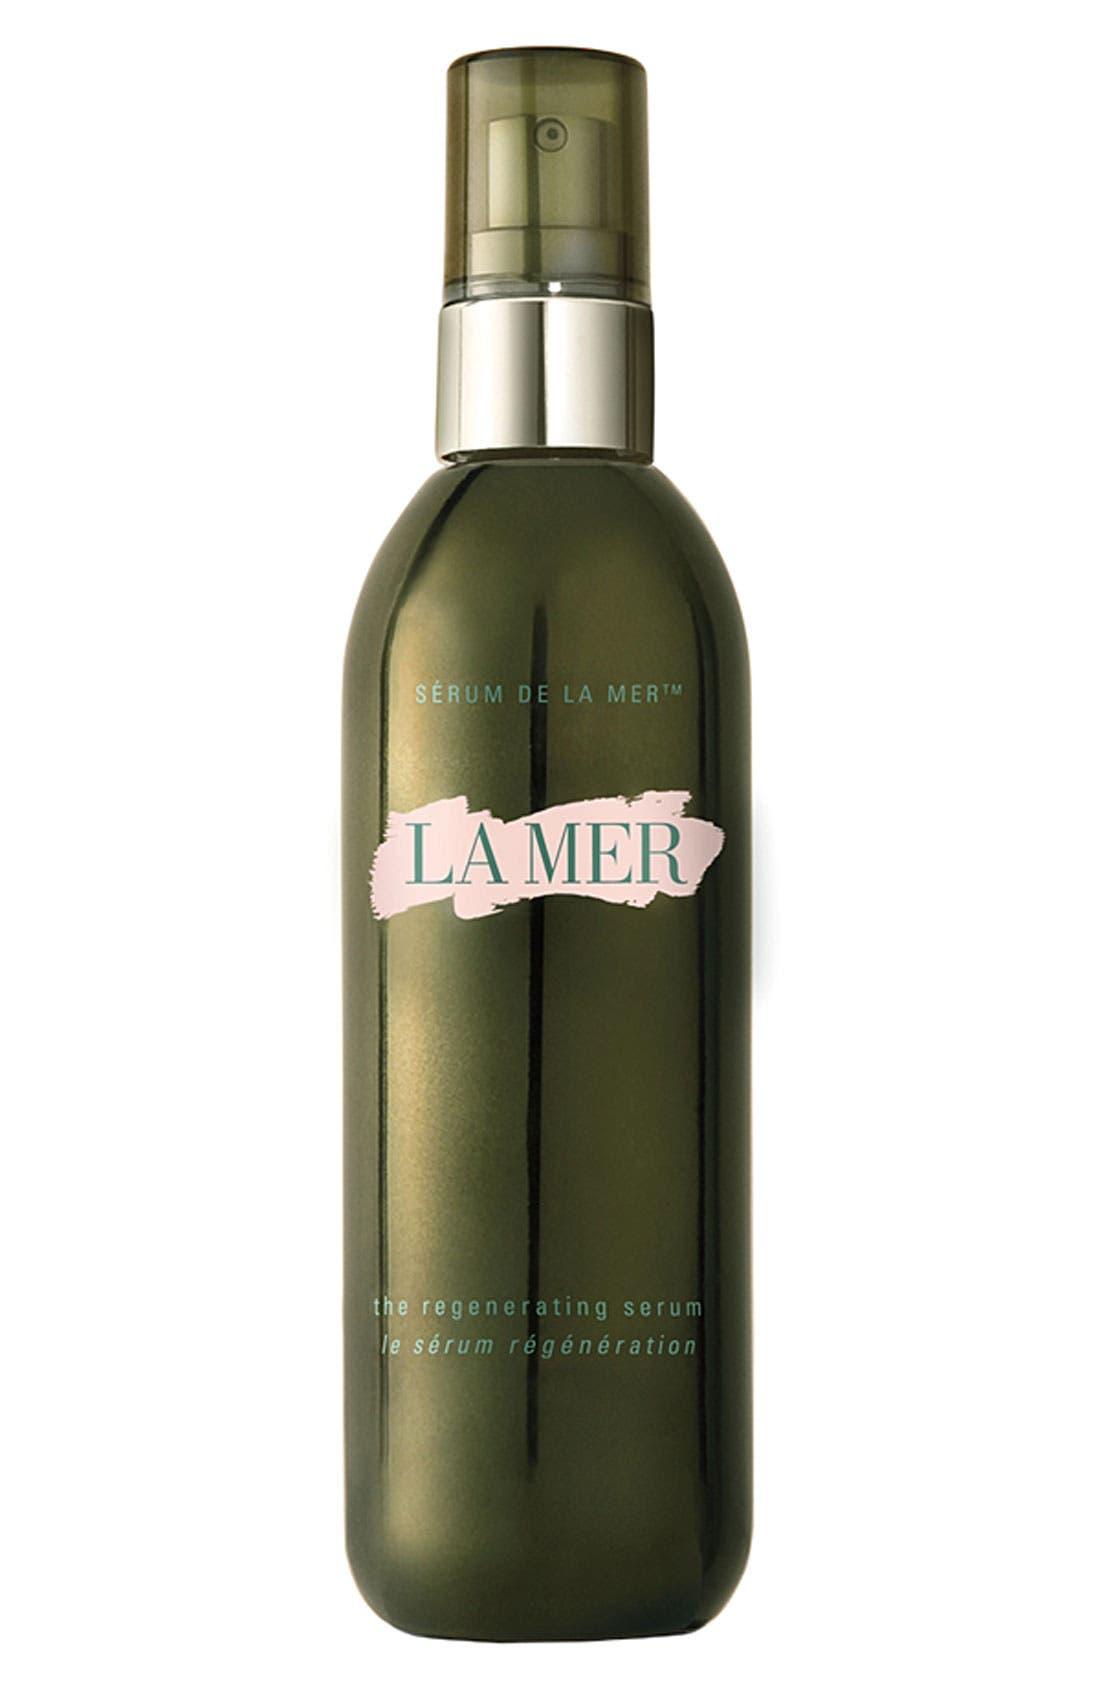 La Mer The Regenerating Serum Grande (Limited Edition) ($725 Value)